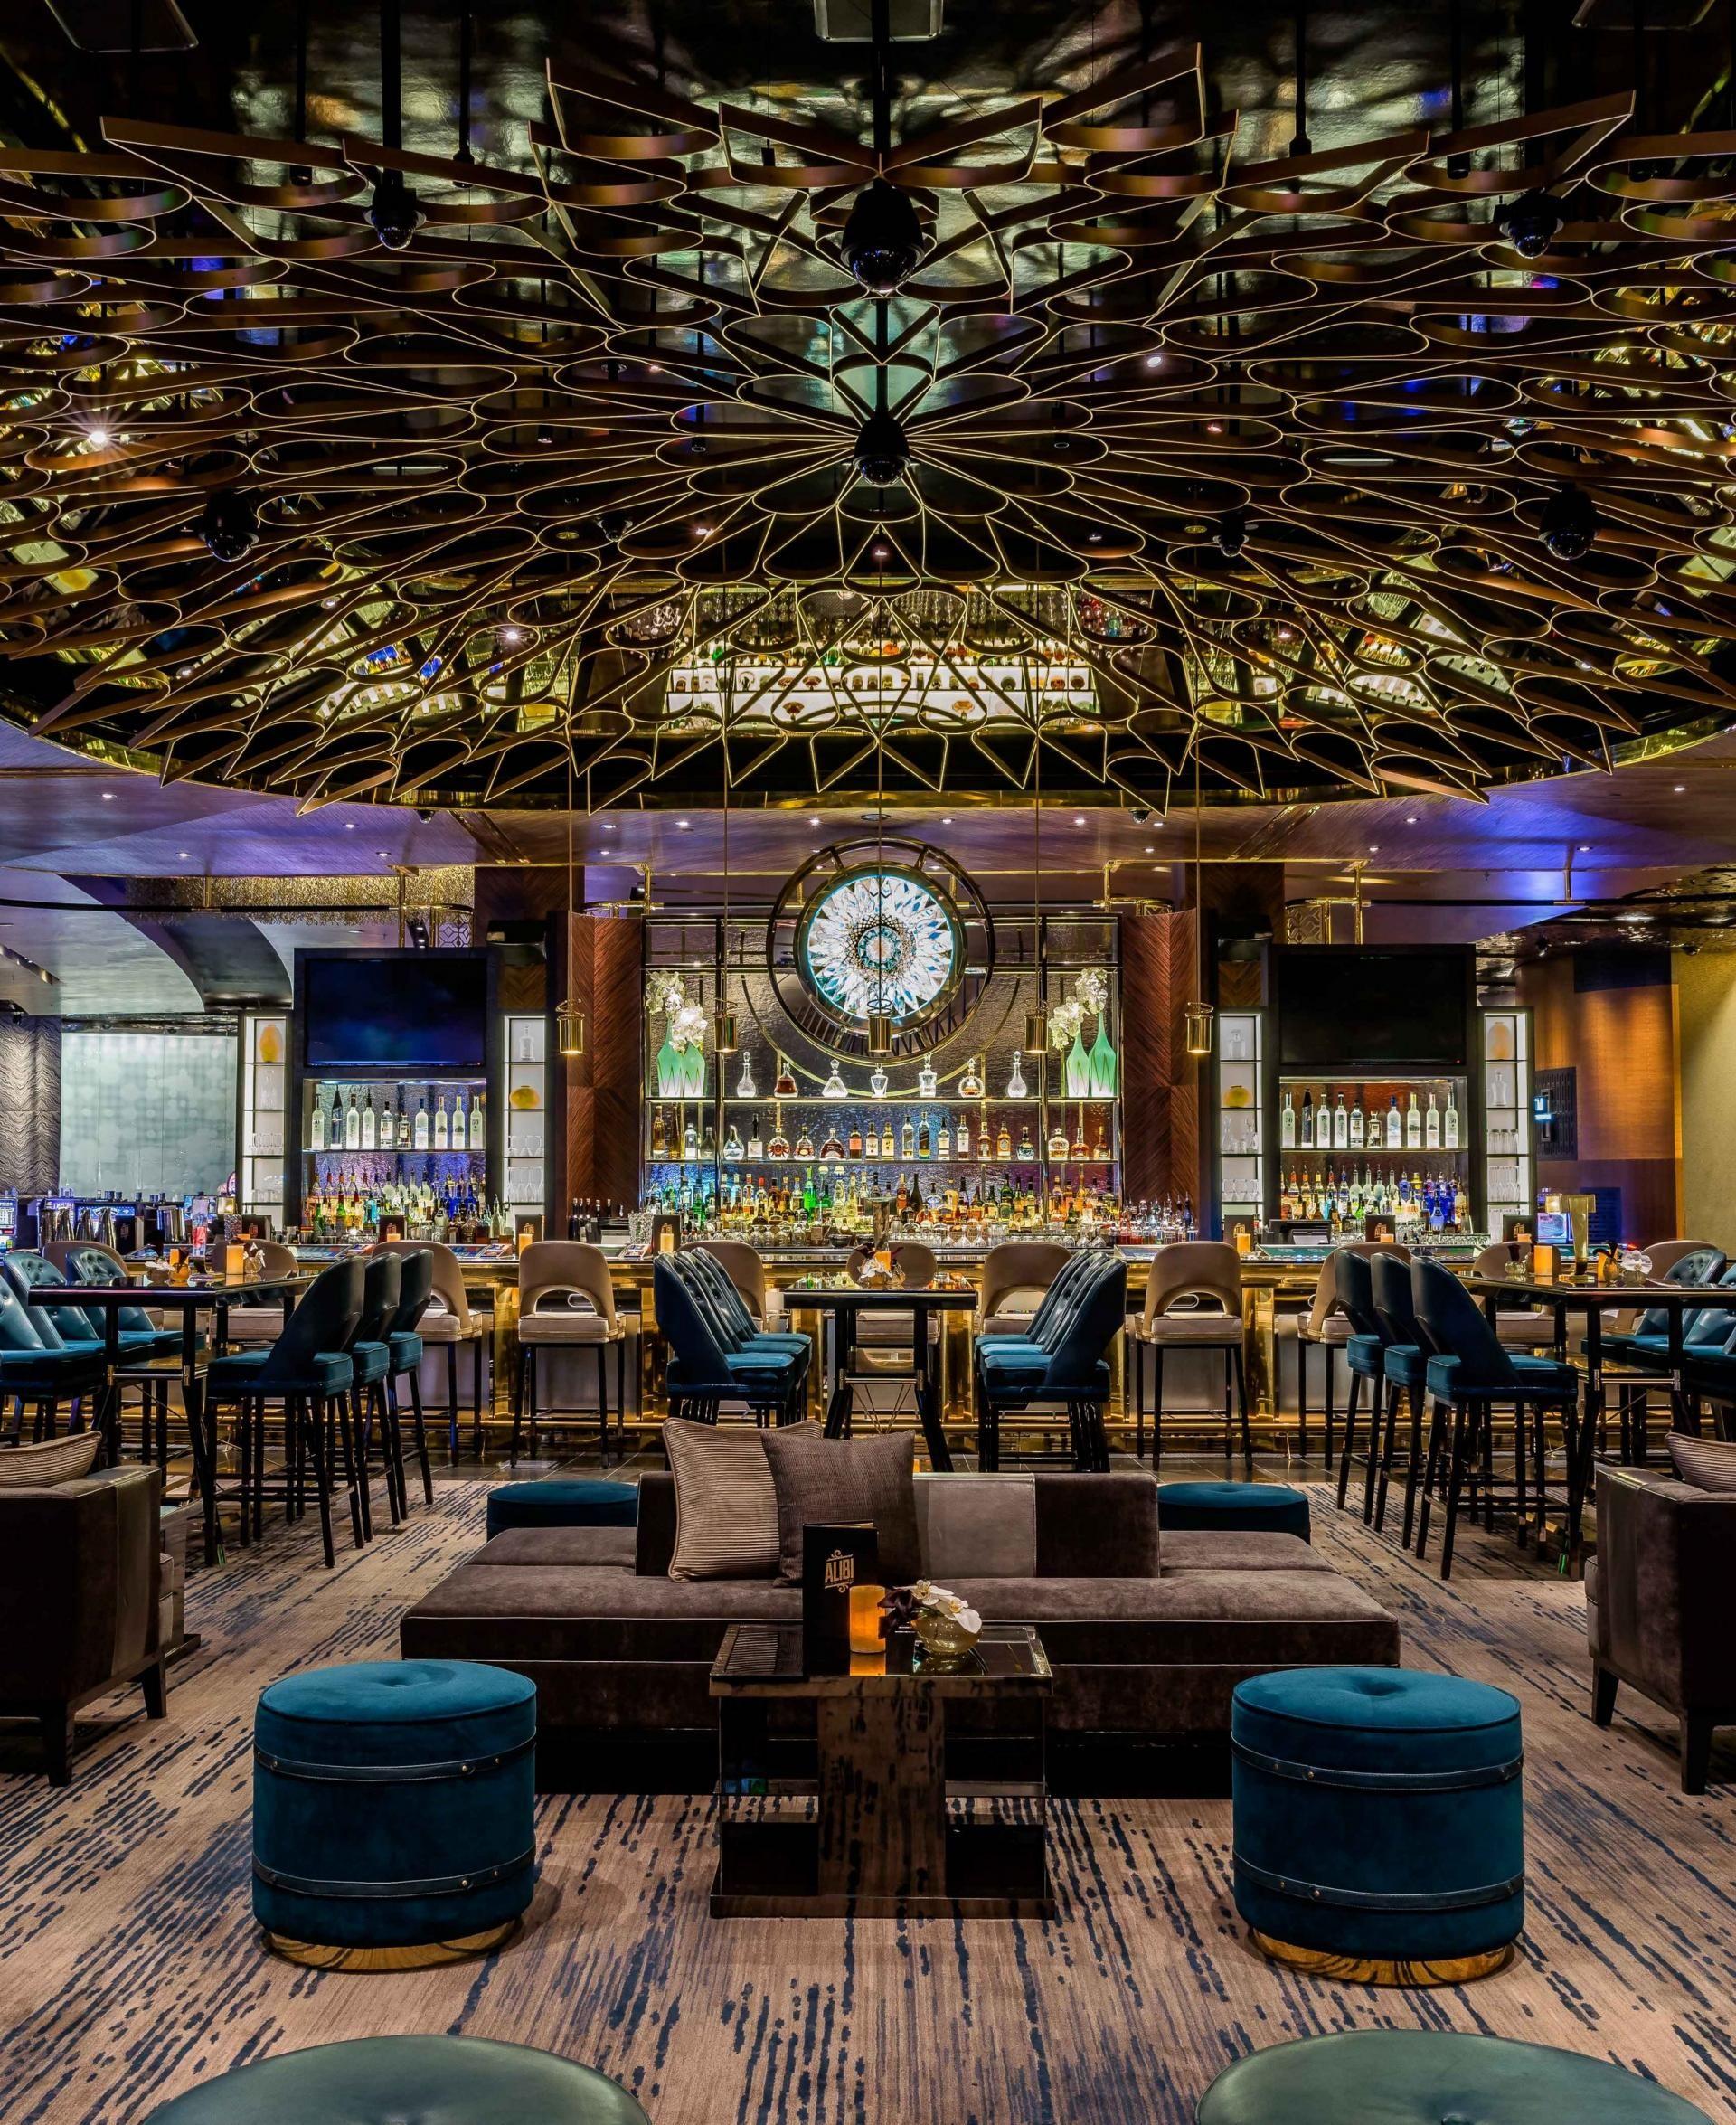 5 Lavish Projects By Studio Munge: Restaurant Design, Bar Interior